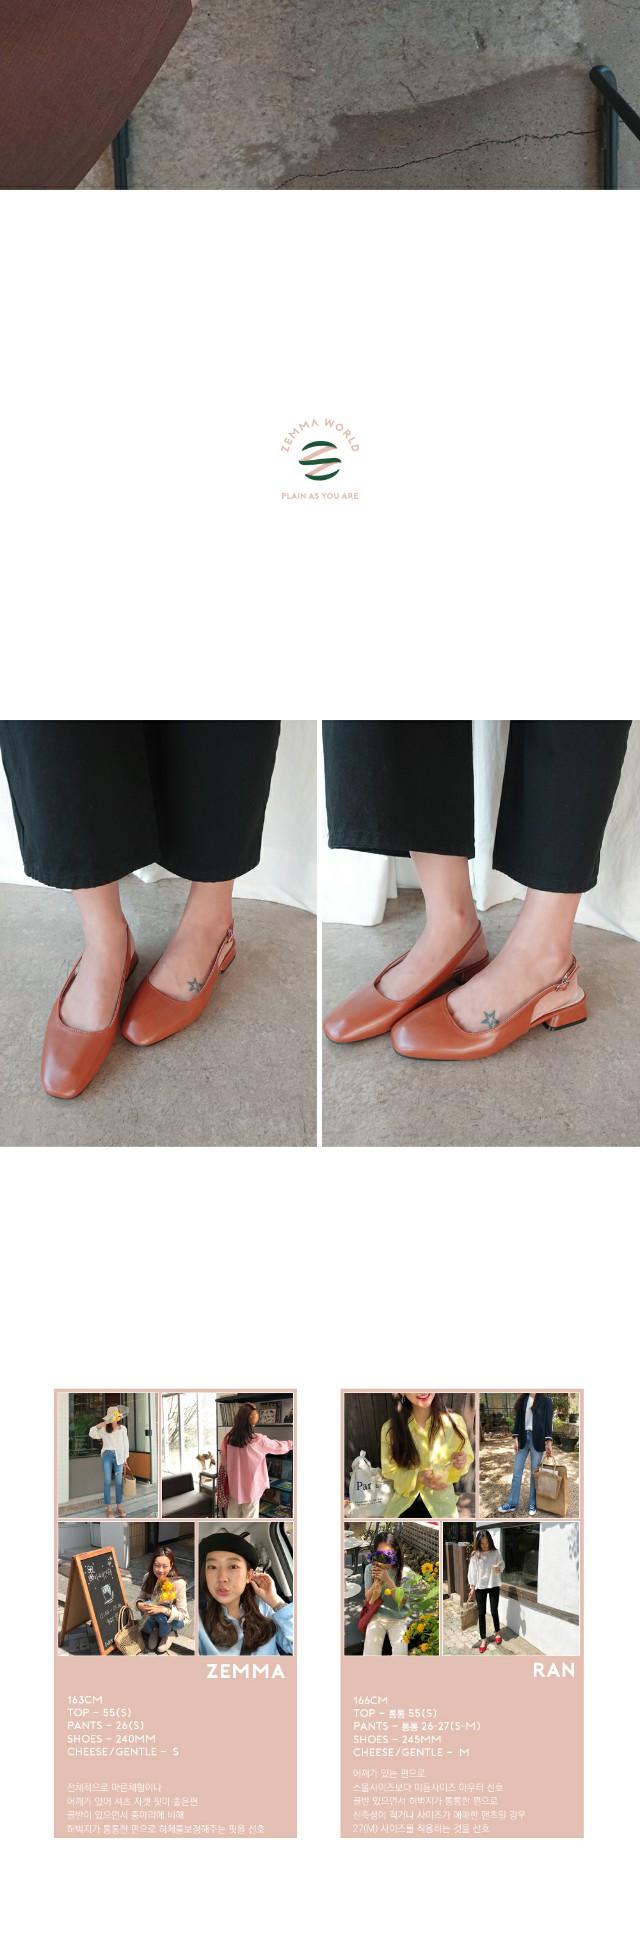 Leave-slingback shoes